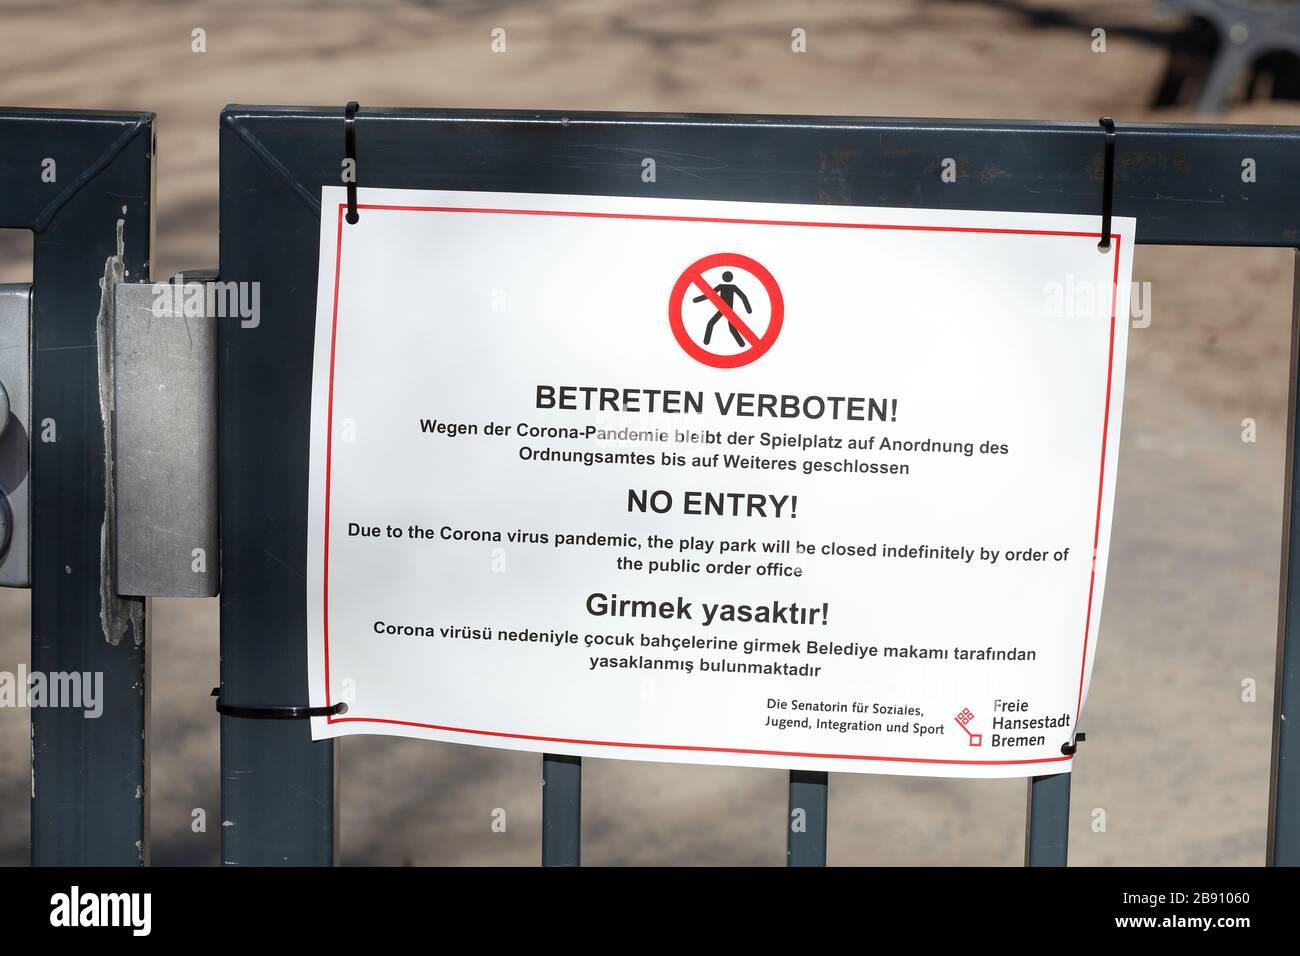 Schild Spielplatz wegen Coronavirus geschlossen, betreten verboten Stock Photo